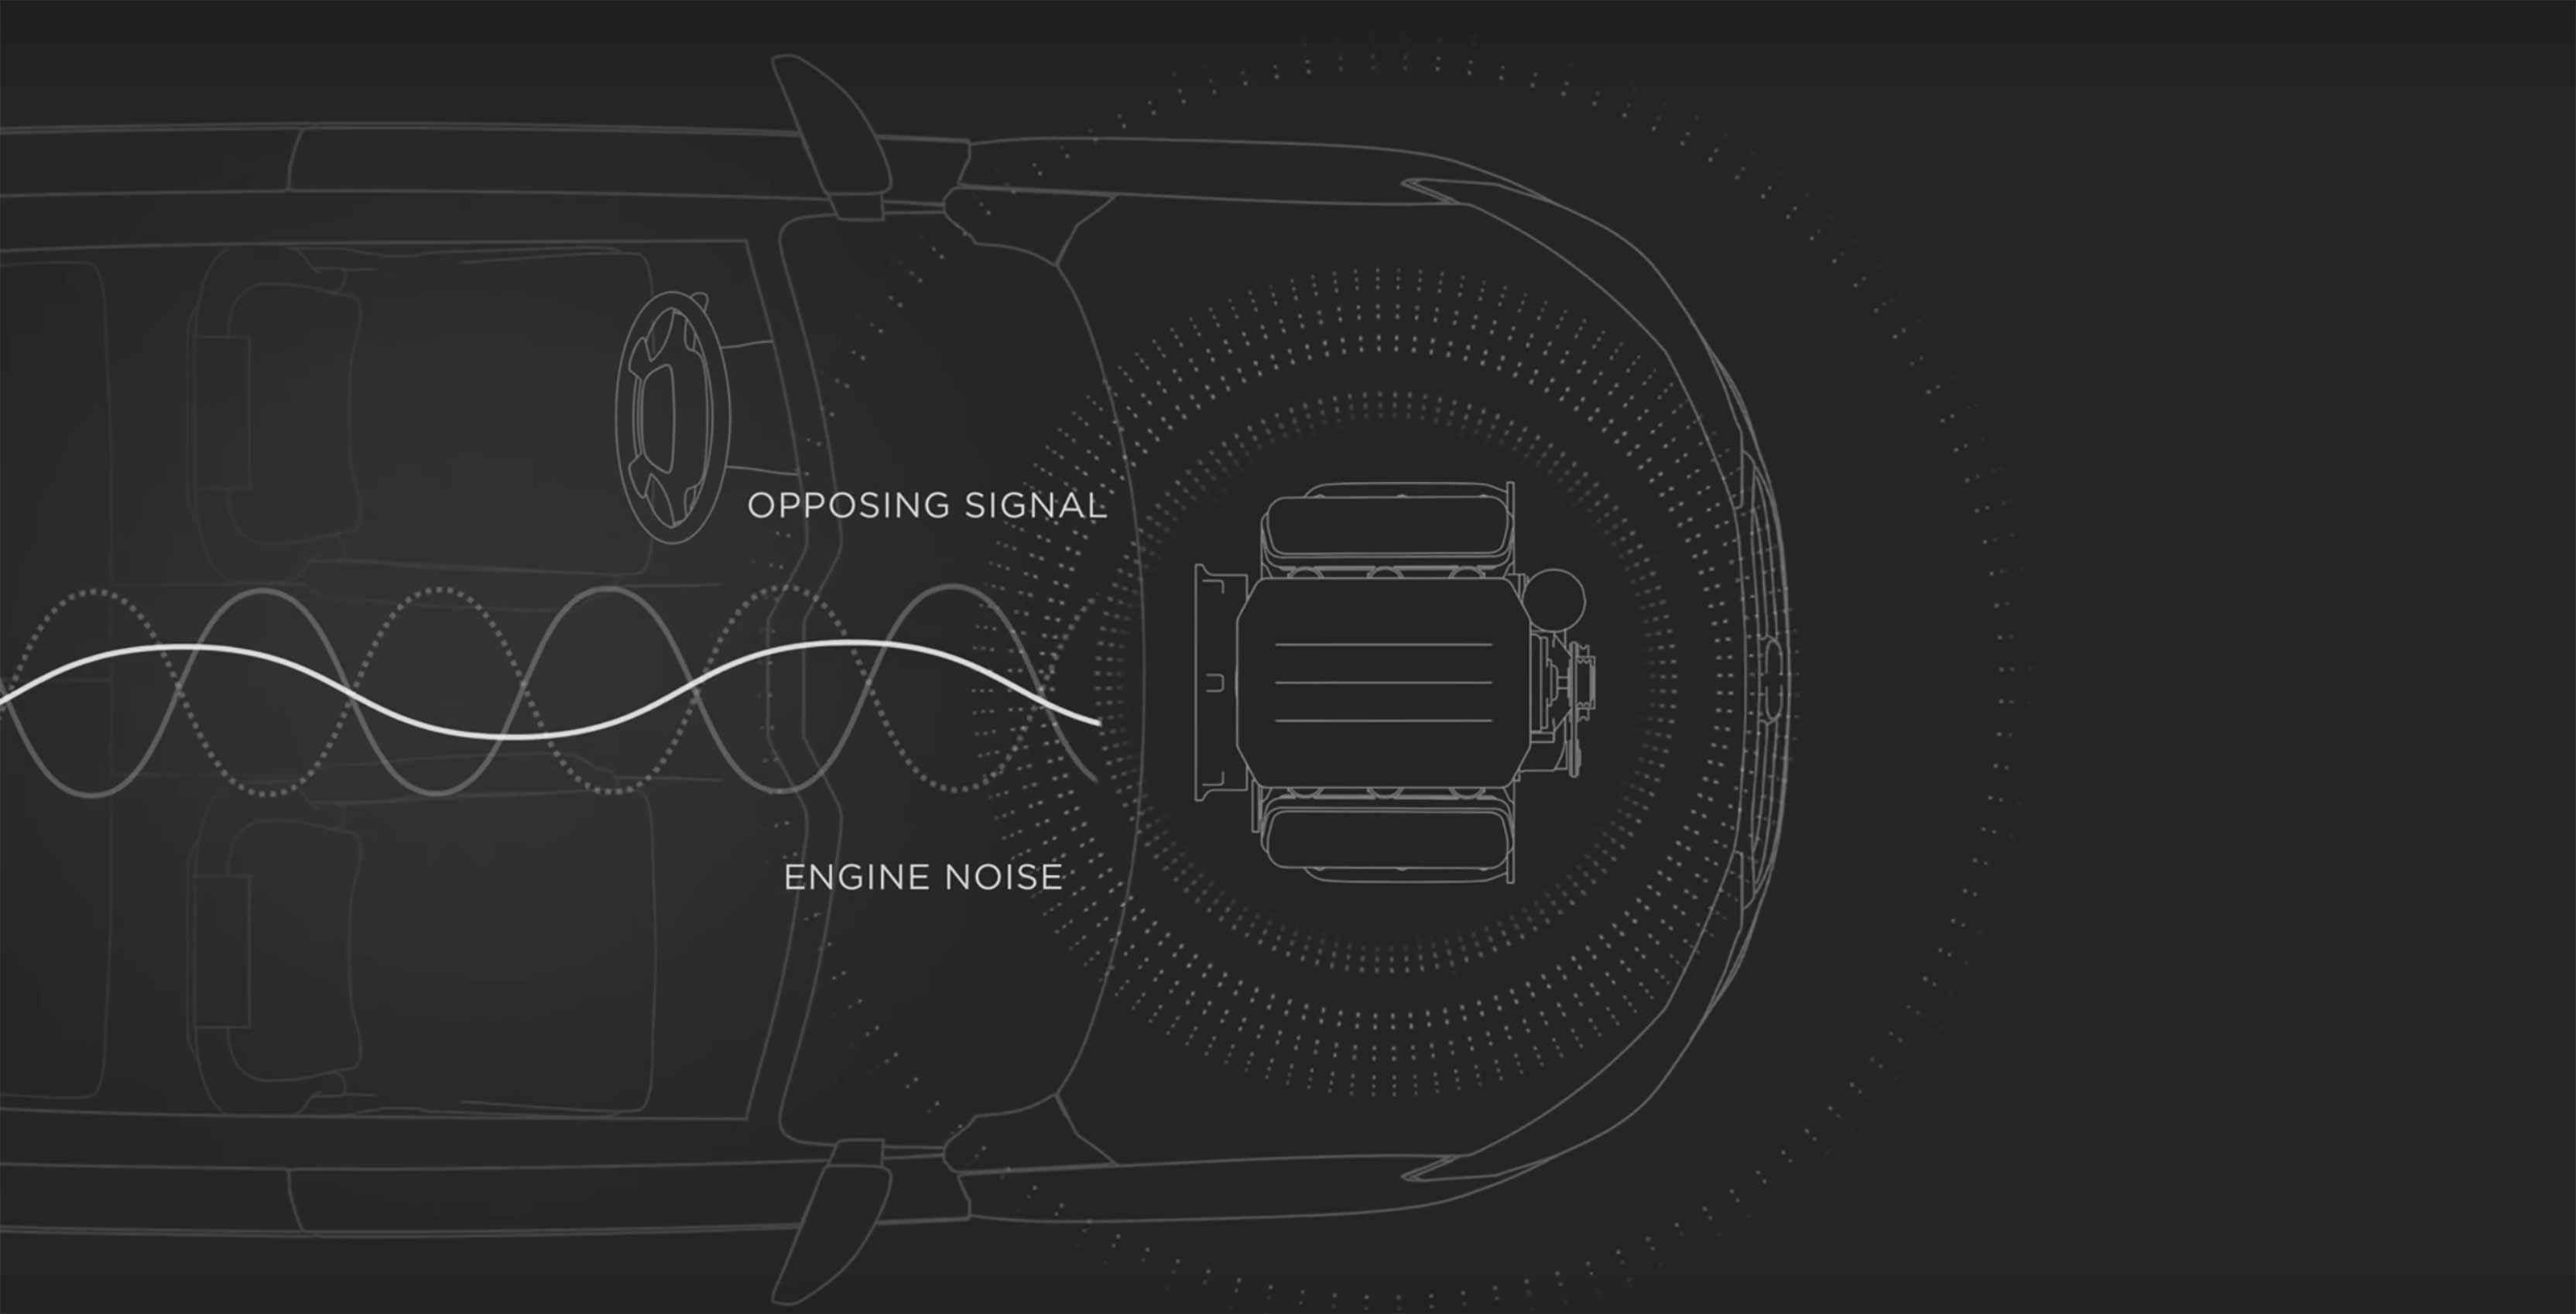 Bose noise-cancelling car tech